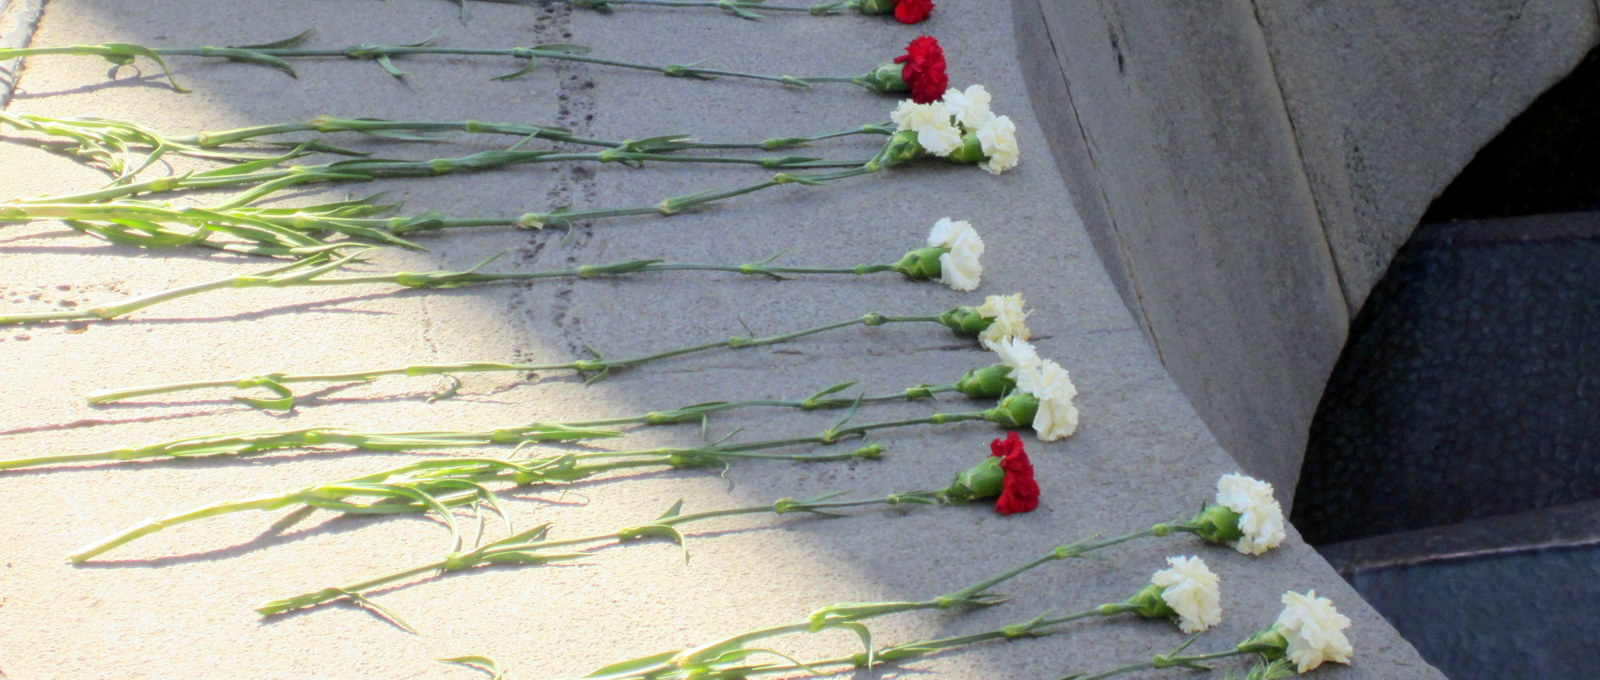 Kansanmurhan muistomerkki Jerevan Armenia